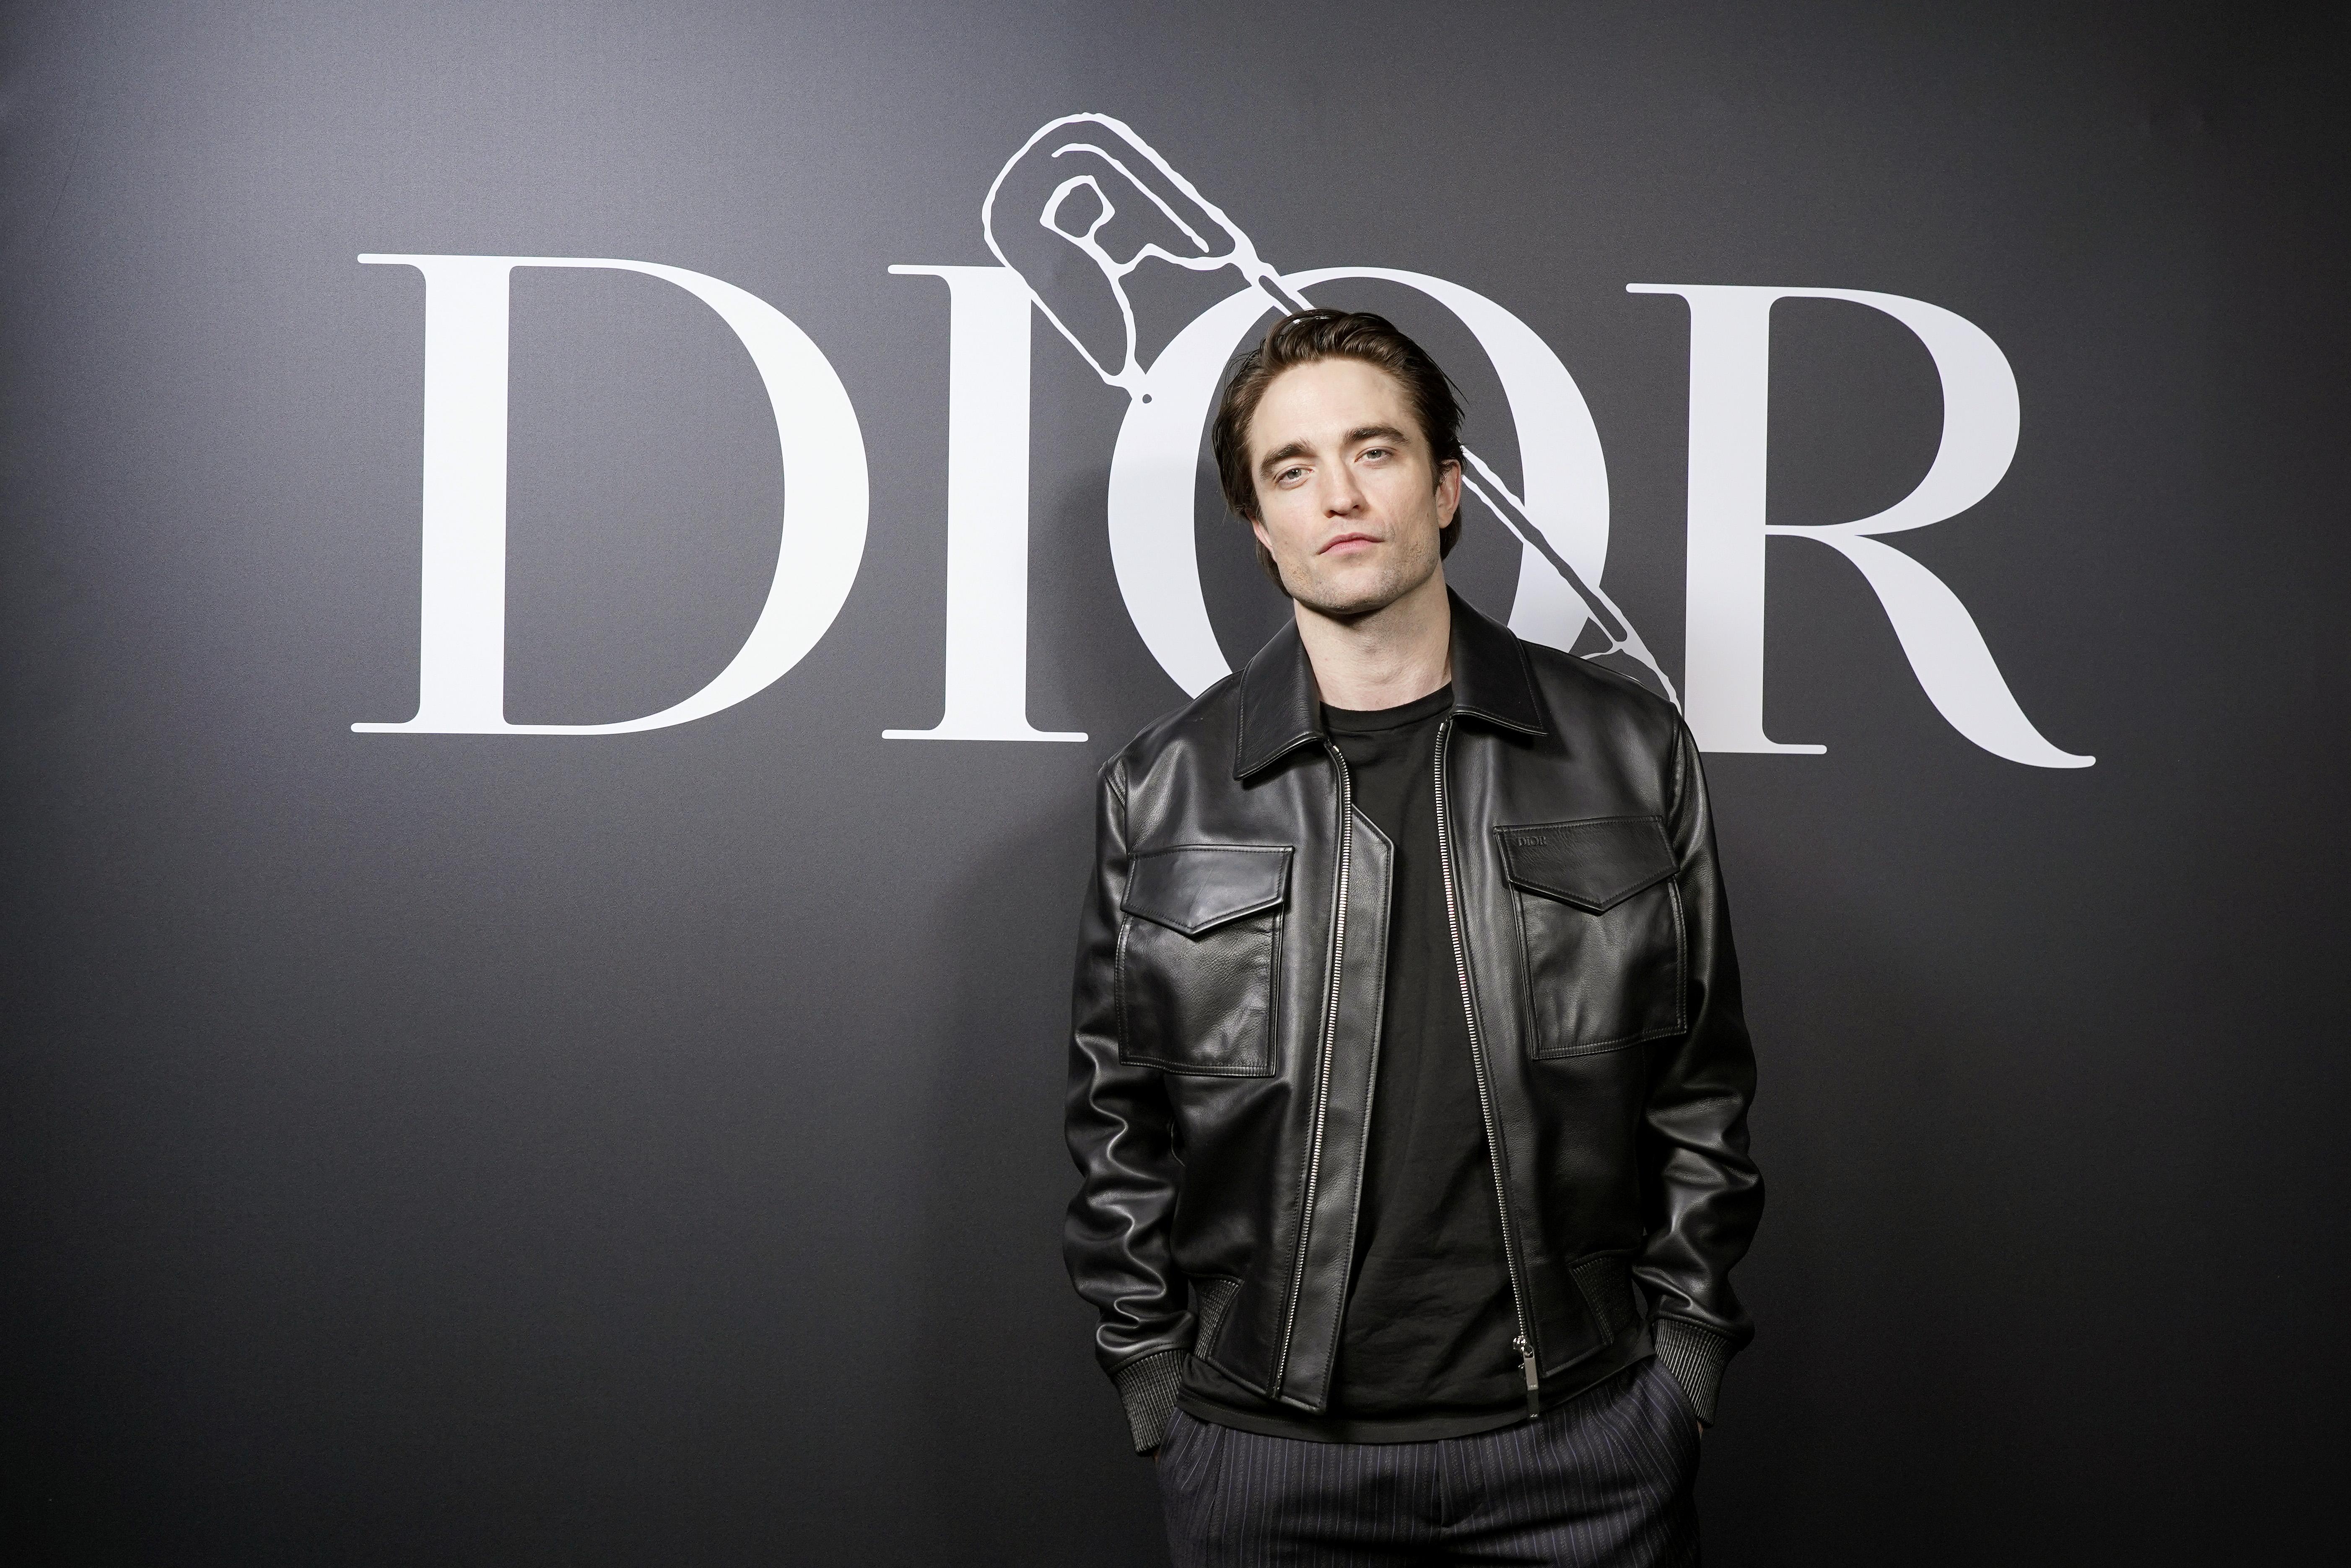 Robert Pattinson Dior Fashion Week 2020